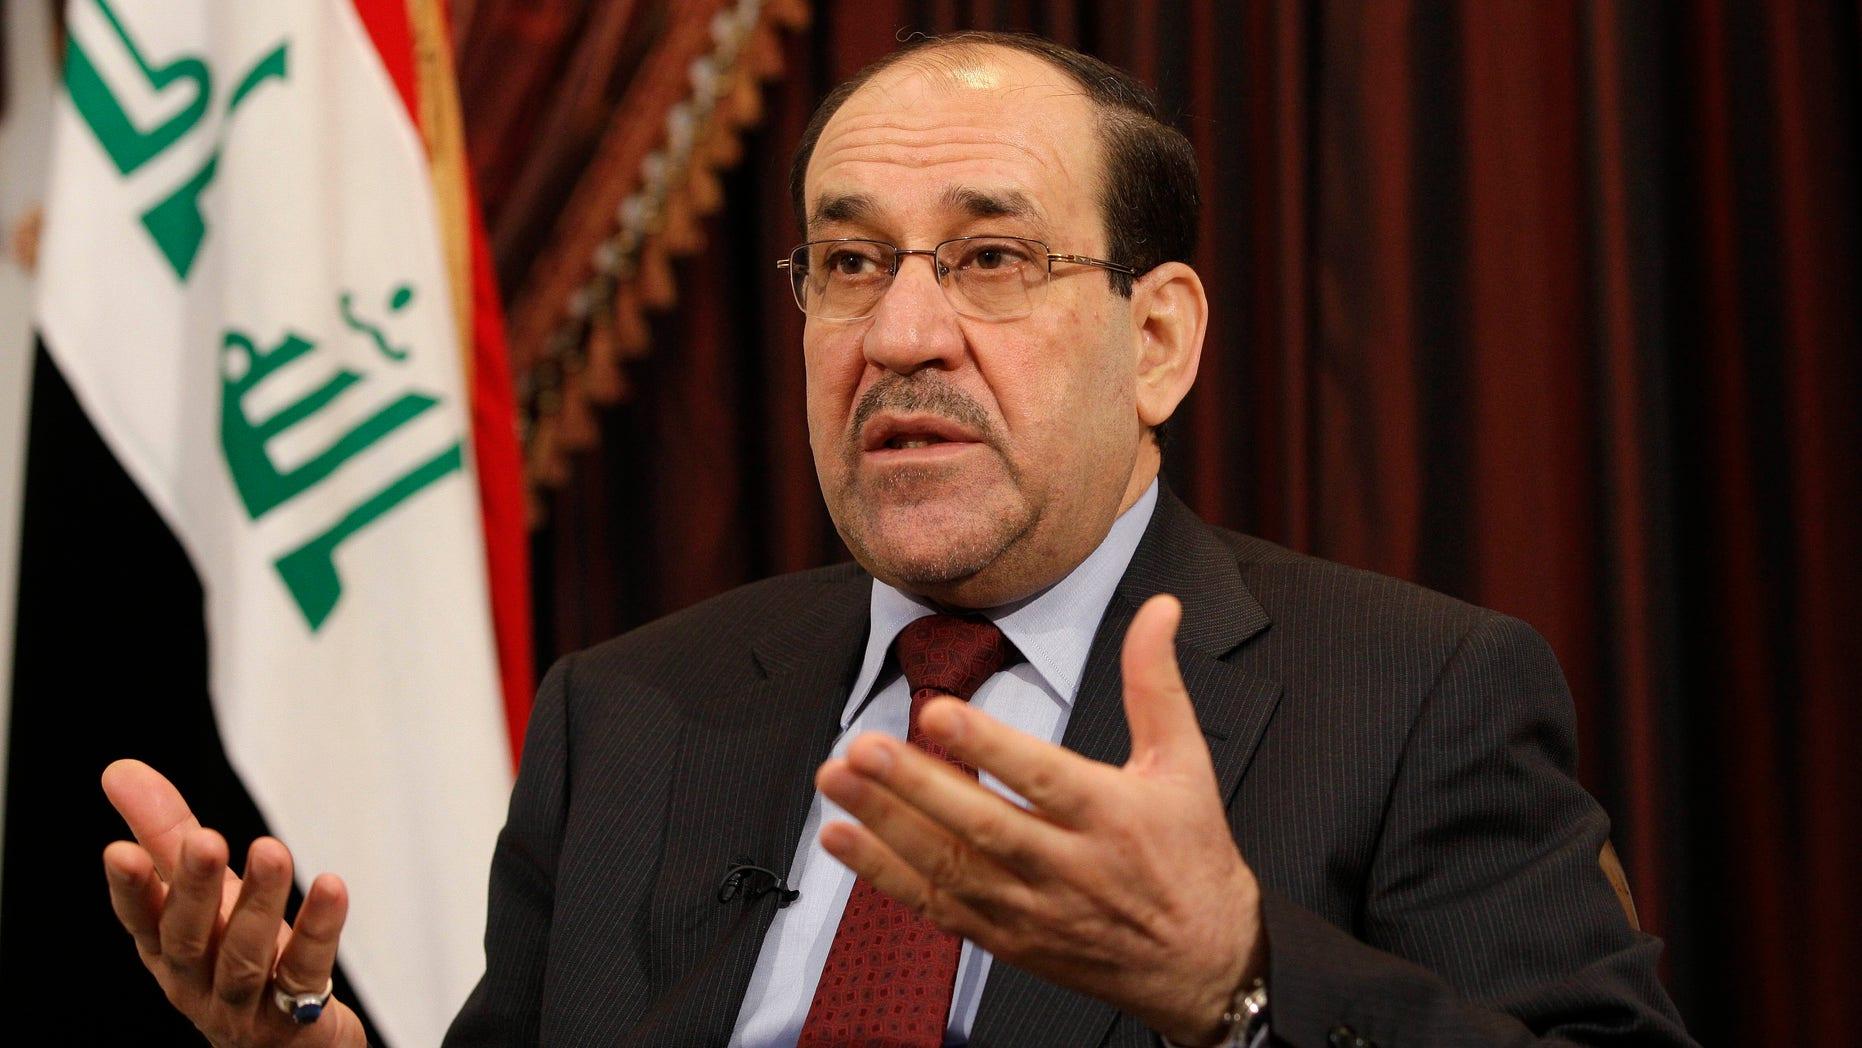 Dec. 3, 2011: Iraq's Prime Minister Nouri al-Maliki.